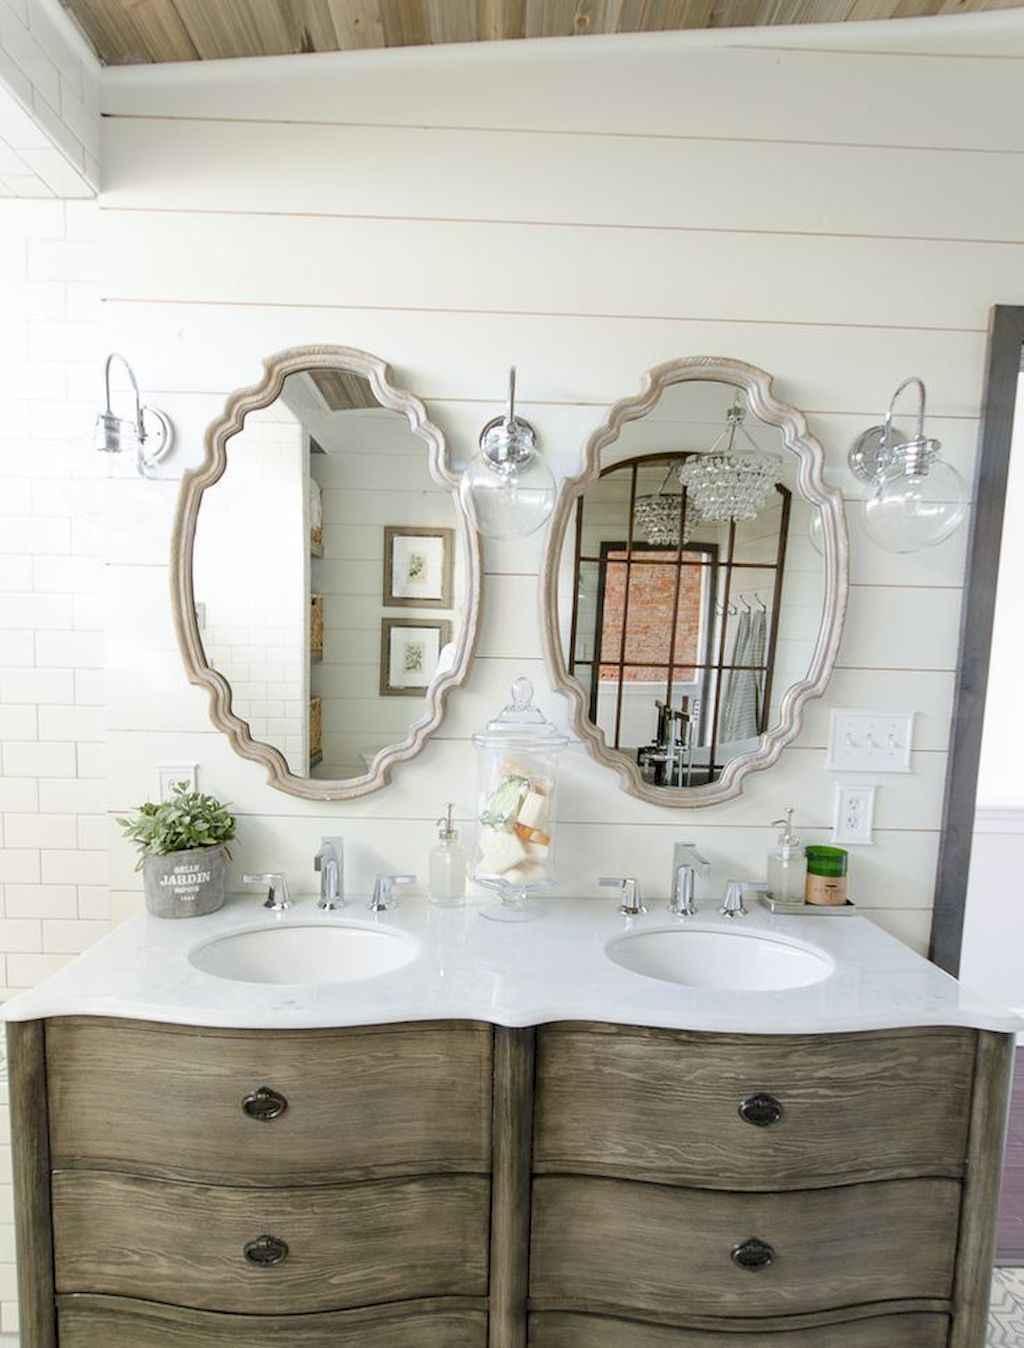 125 awesome farmhouse bathroom vanity remodel ideas (23)